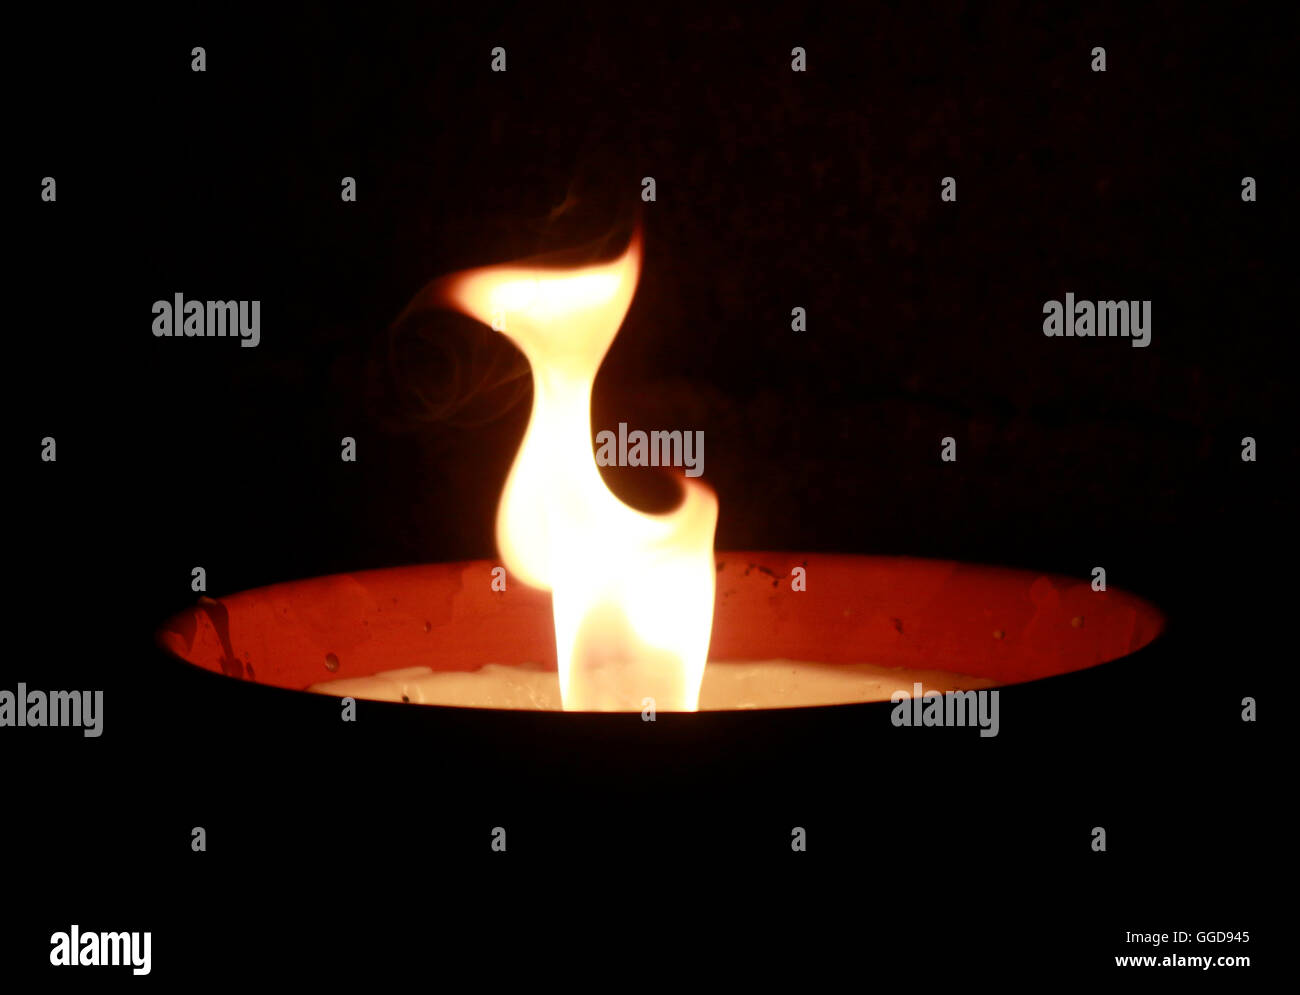 Feuer fuego oscuridad nocturna luz de velas atmósfera duelo simbólico feuerschale gedenken mounring símbolo Imagen De Stock